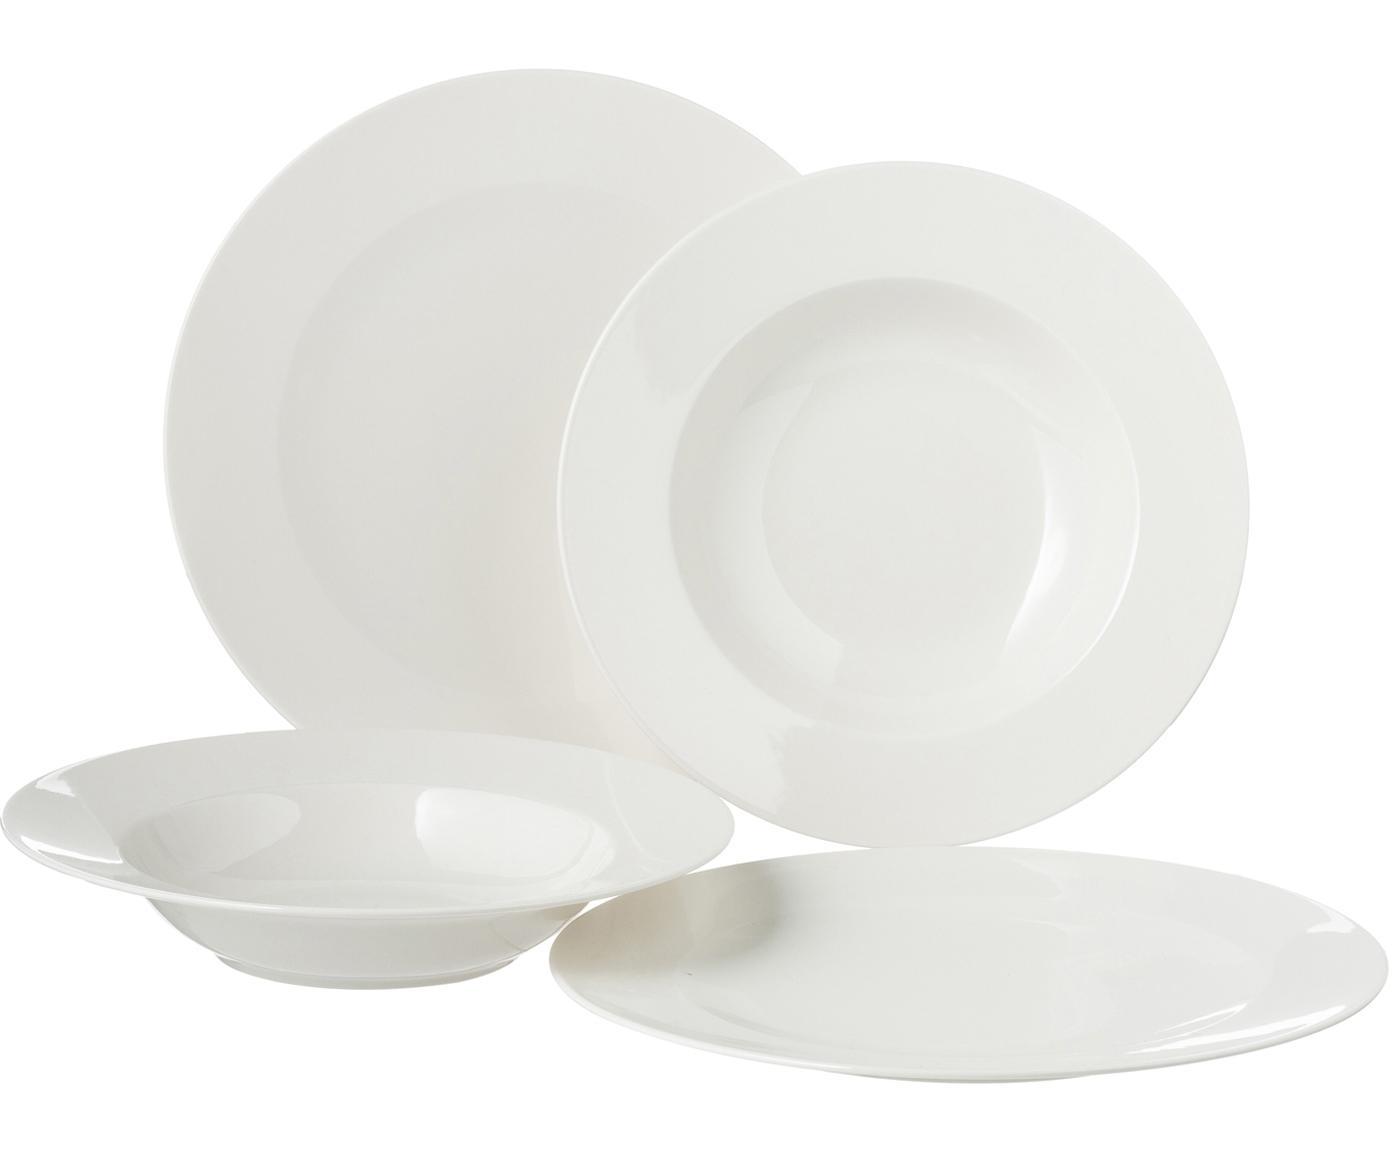 Vajila For Me, 6comensales (8 pzas.), Porcelana, Blanco, Tamaños diferentes